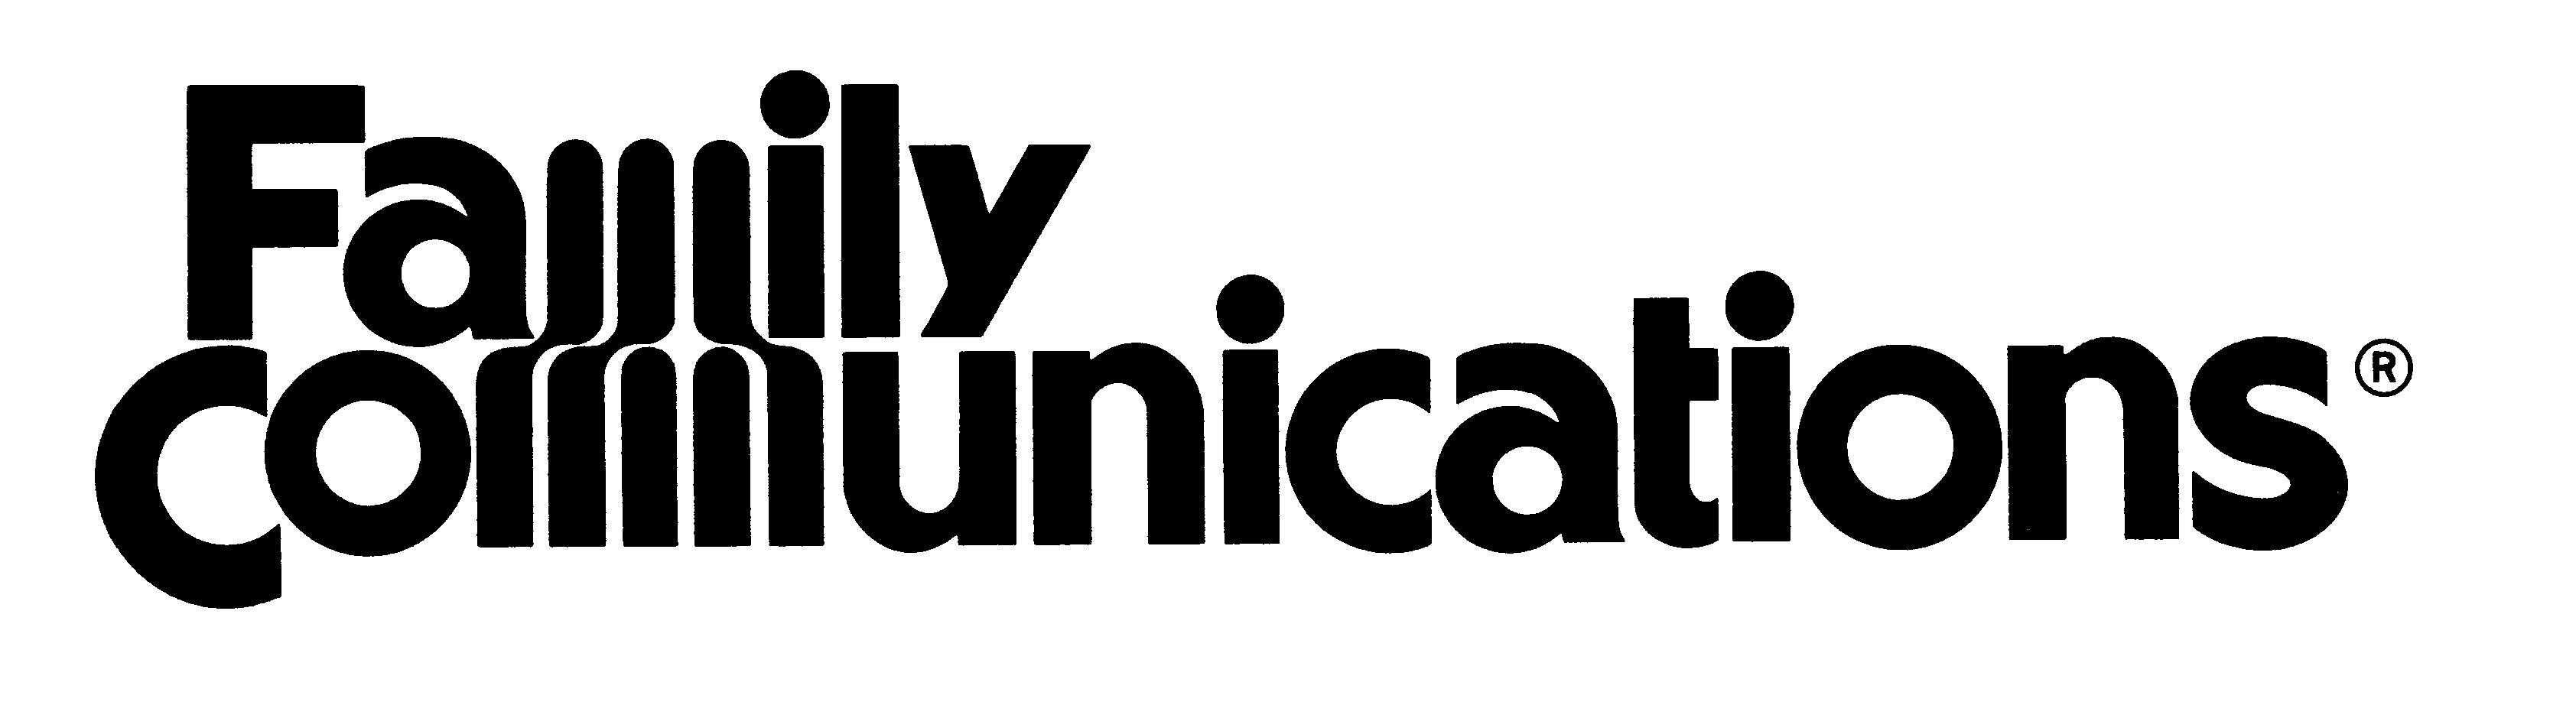 Family Communications Logo Mister Rogers Neighborhood